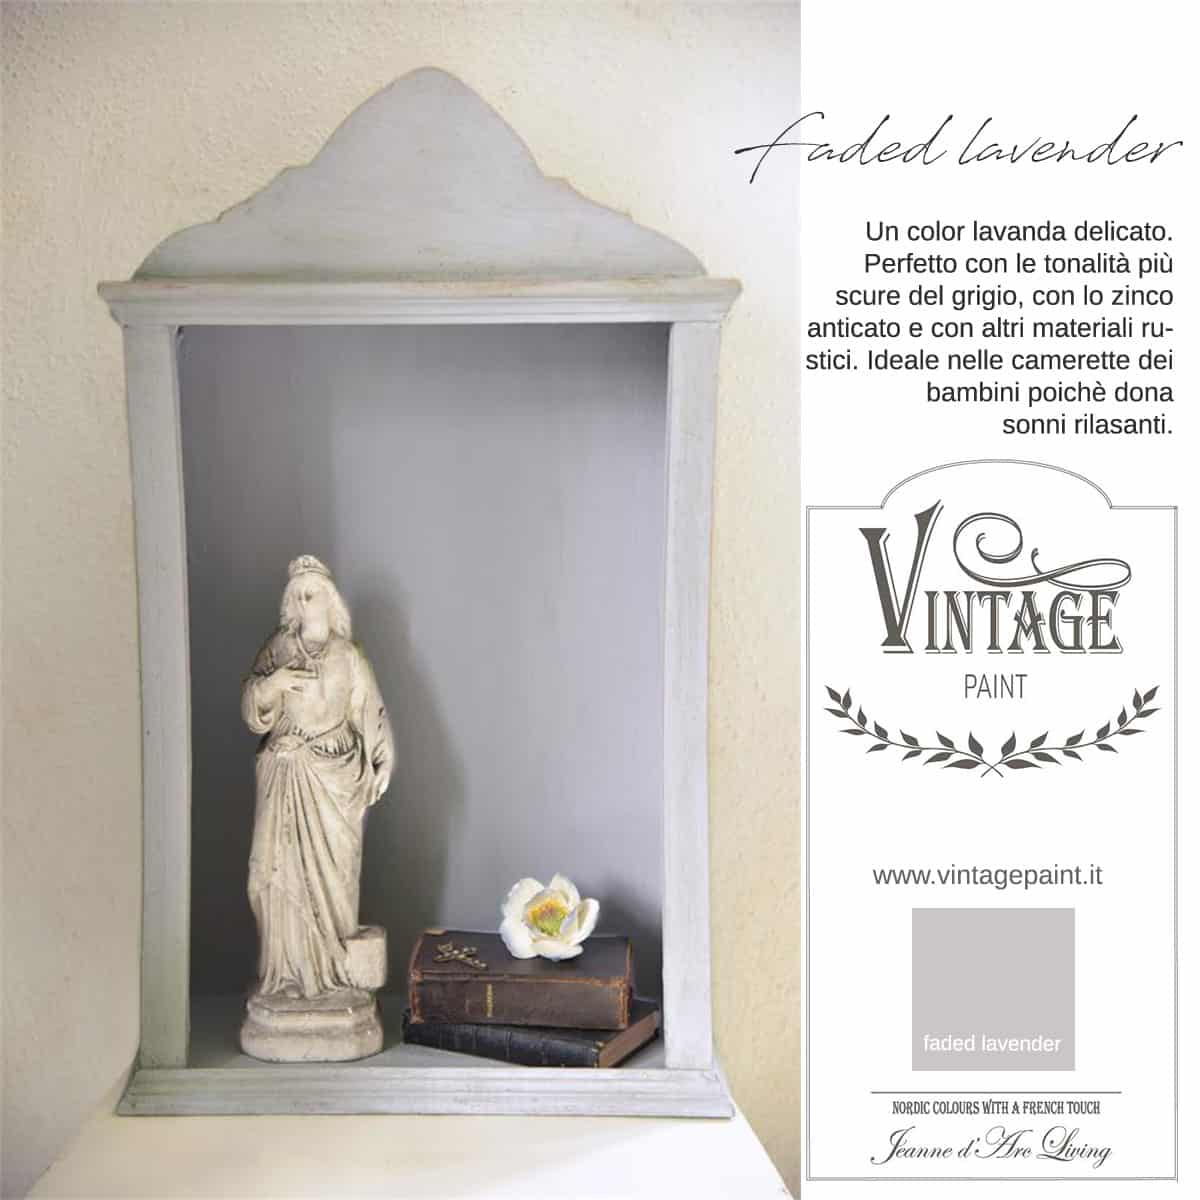 faded lavender lavanda viola vintage chalk paint vernici shabby chic autentico look gesso